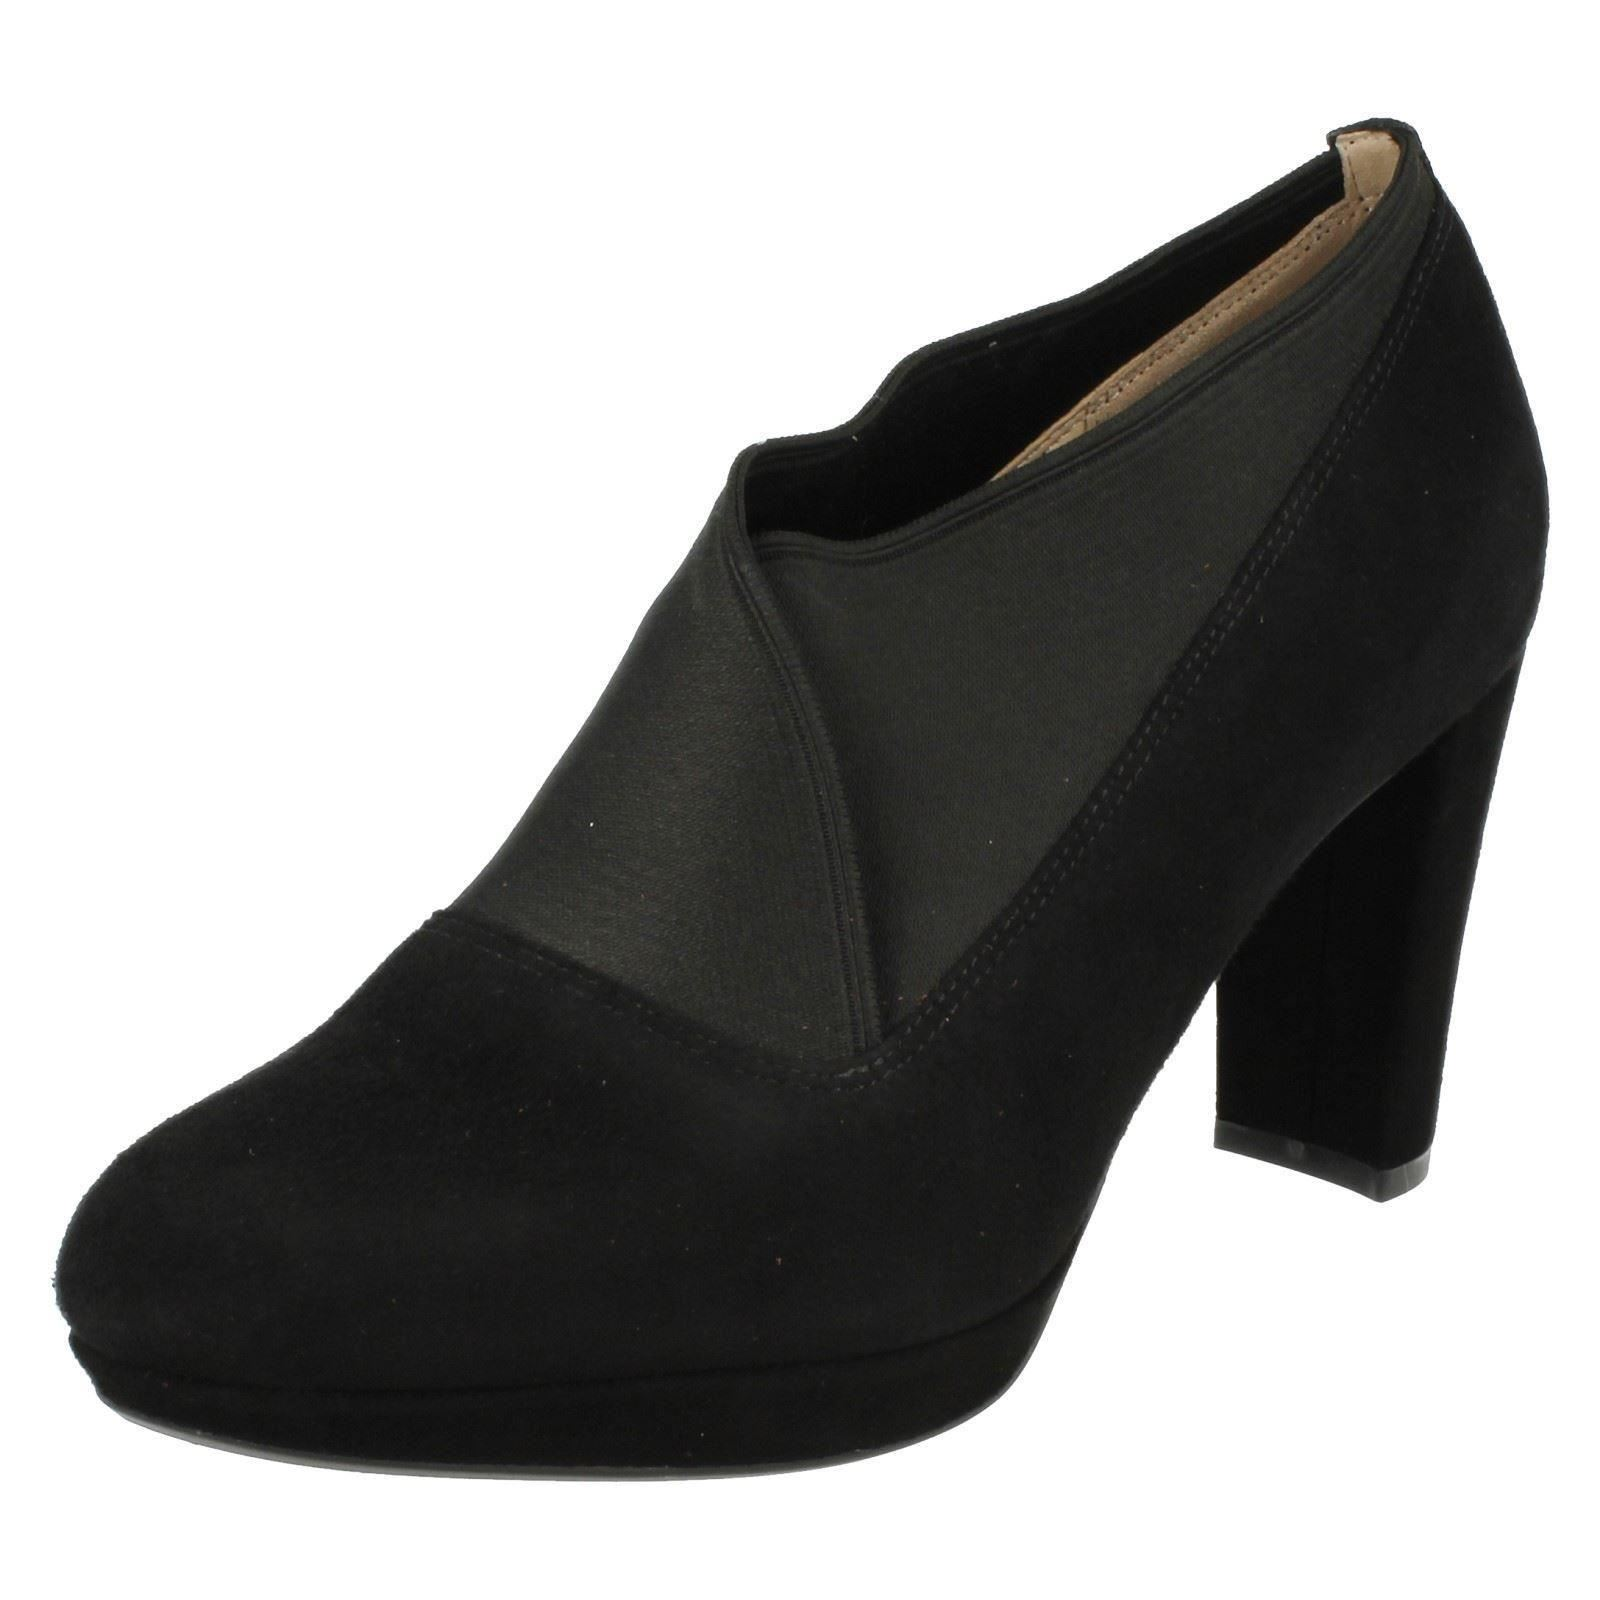 Clarks Black Elasticated Shoe